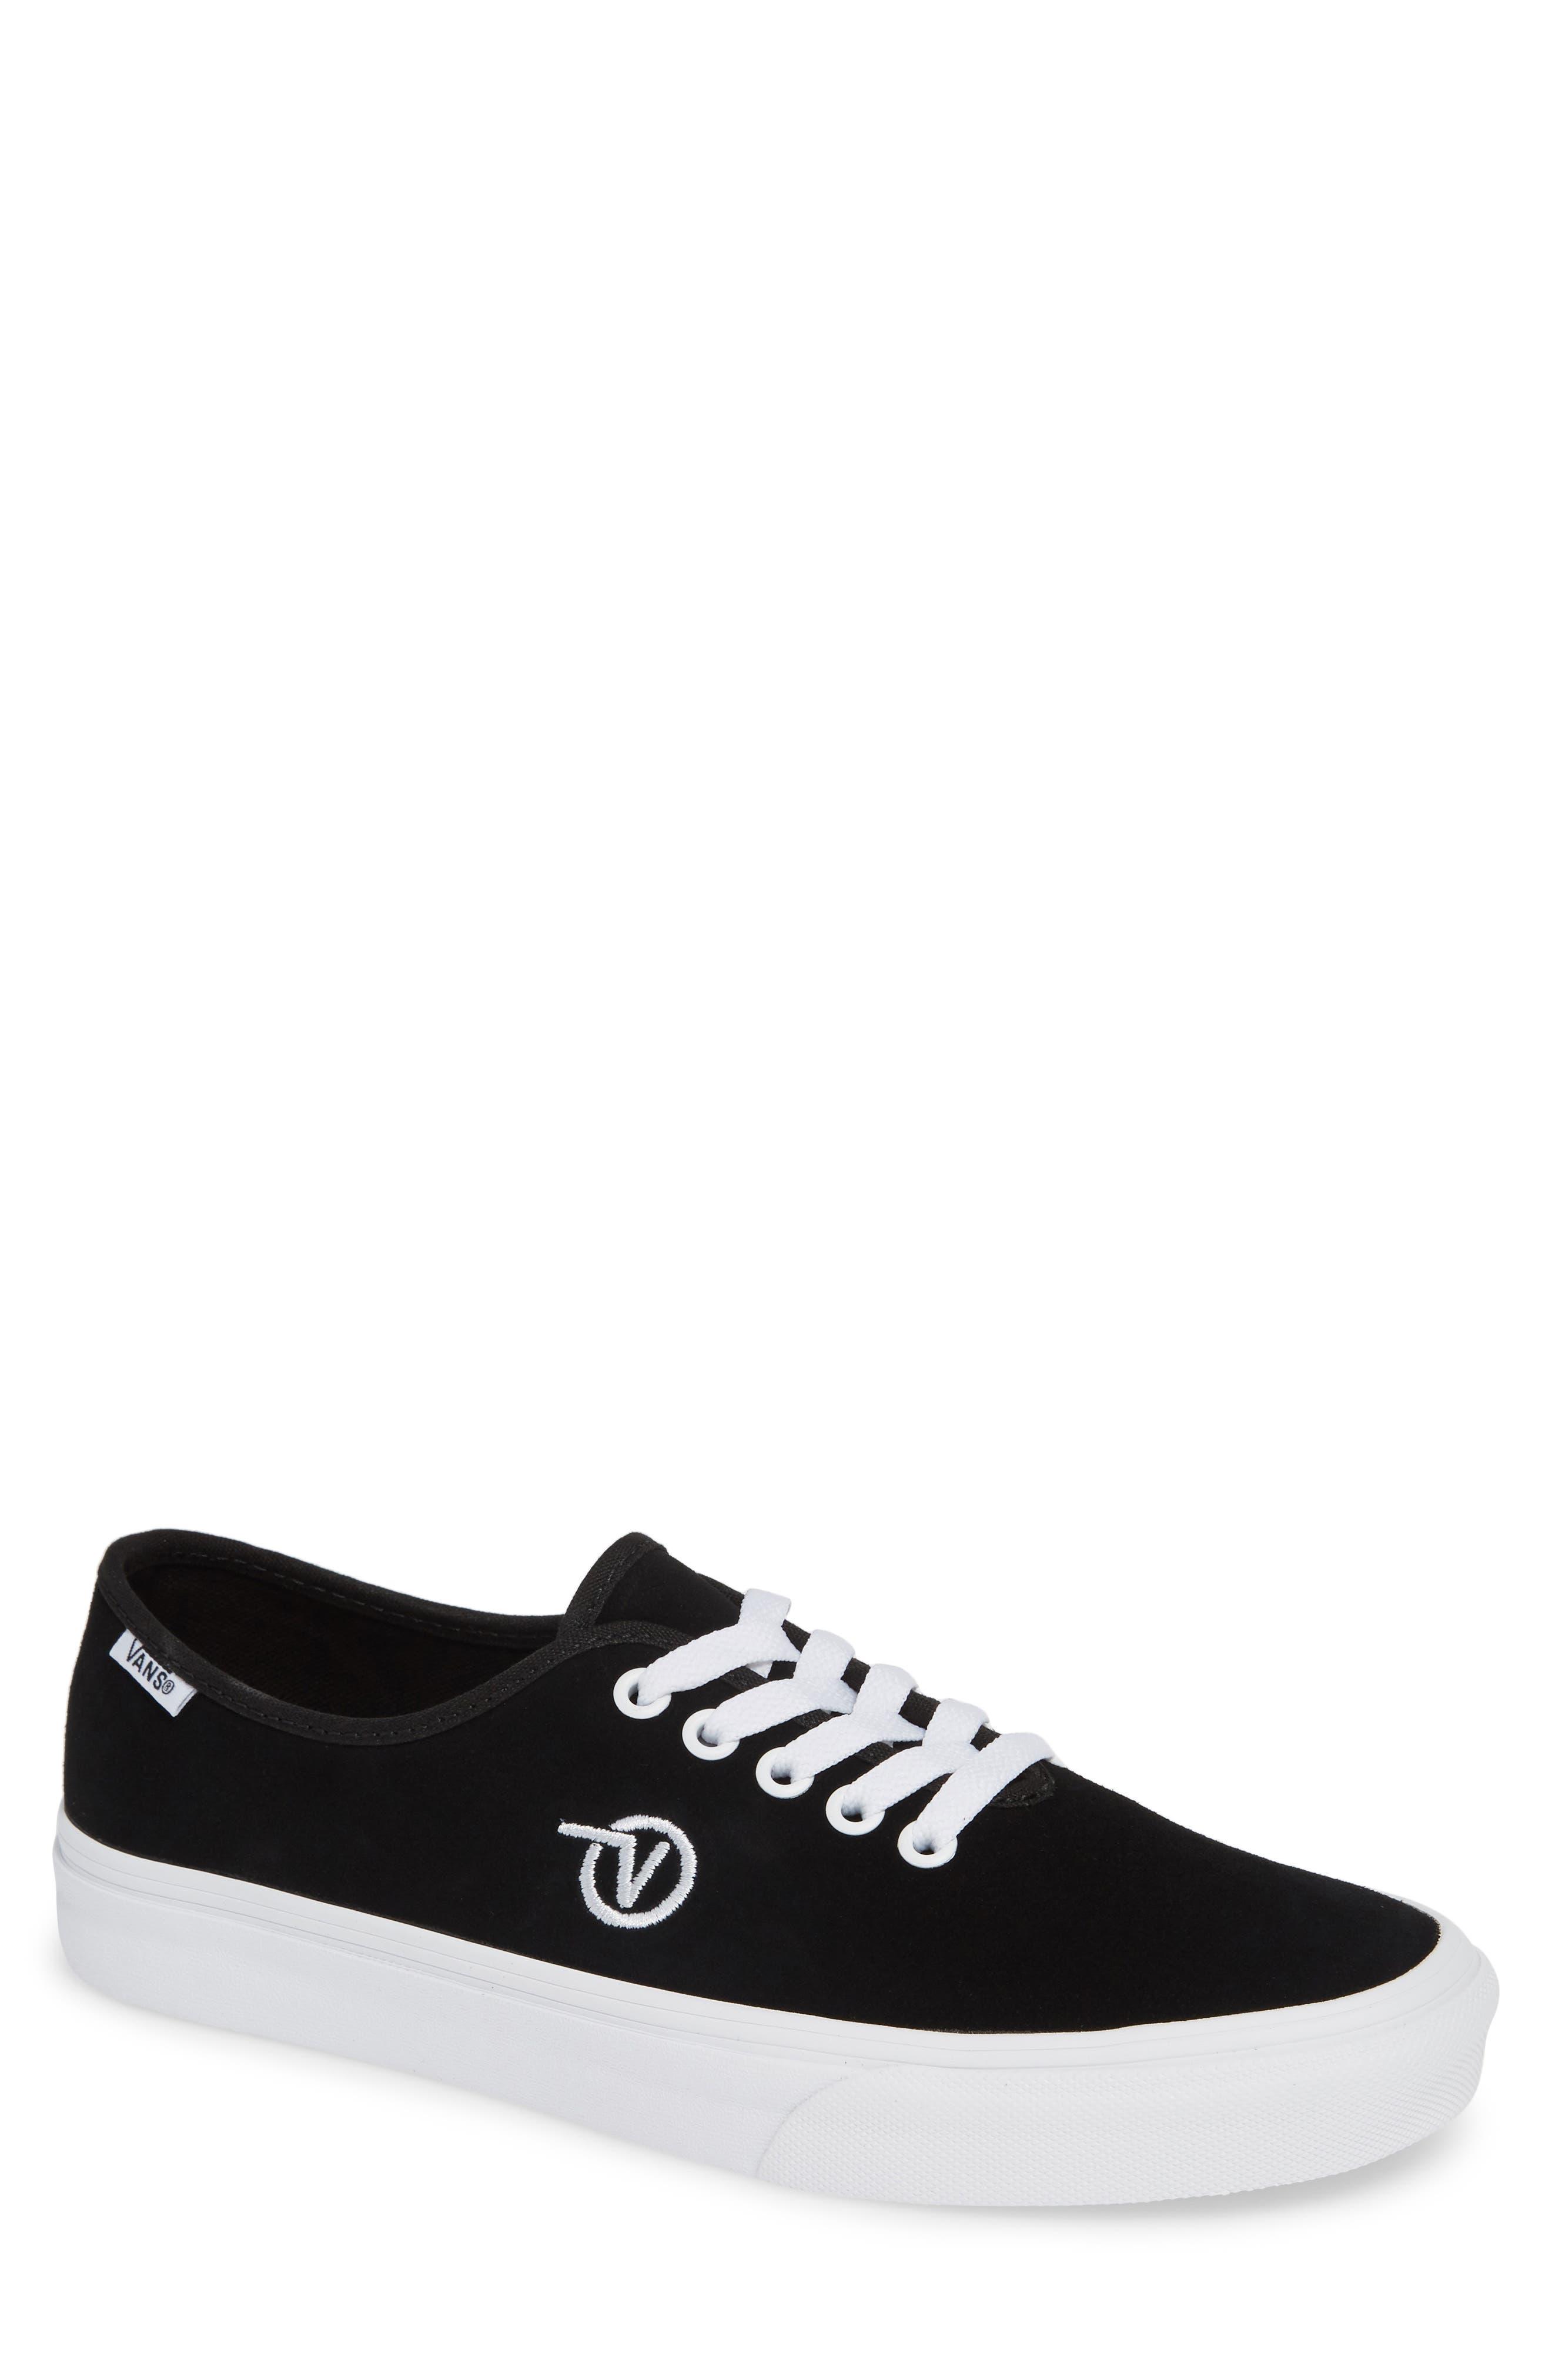 Authentic One-Piece Sneaker,                         Main,                         color, BLACK/ SUEDE